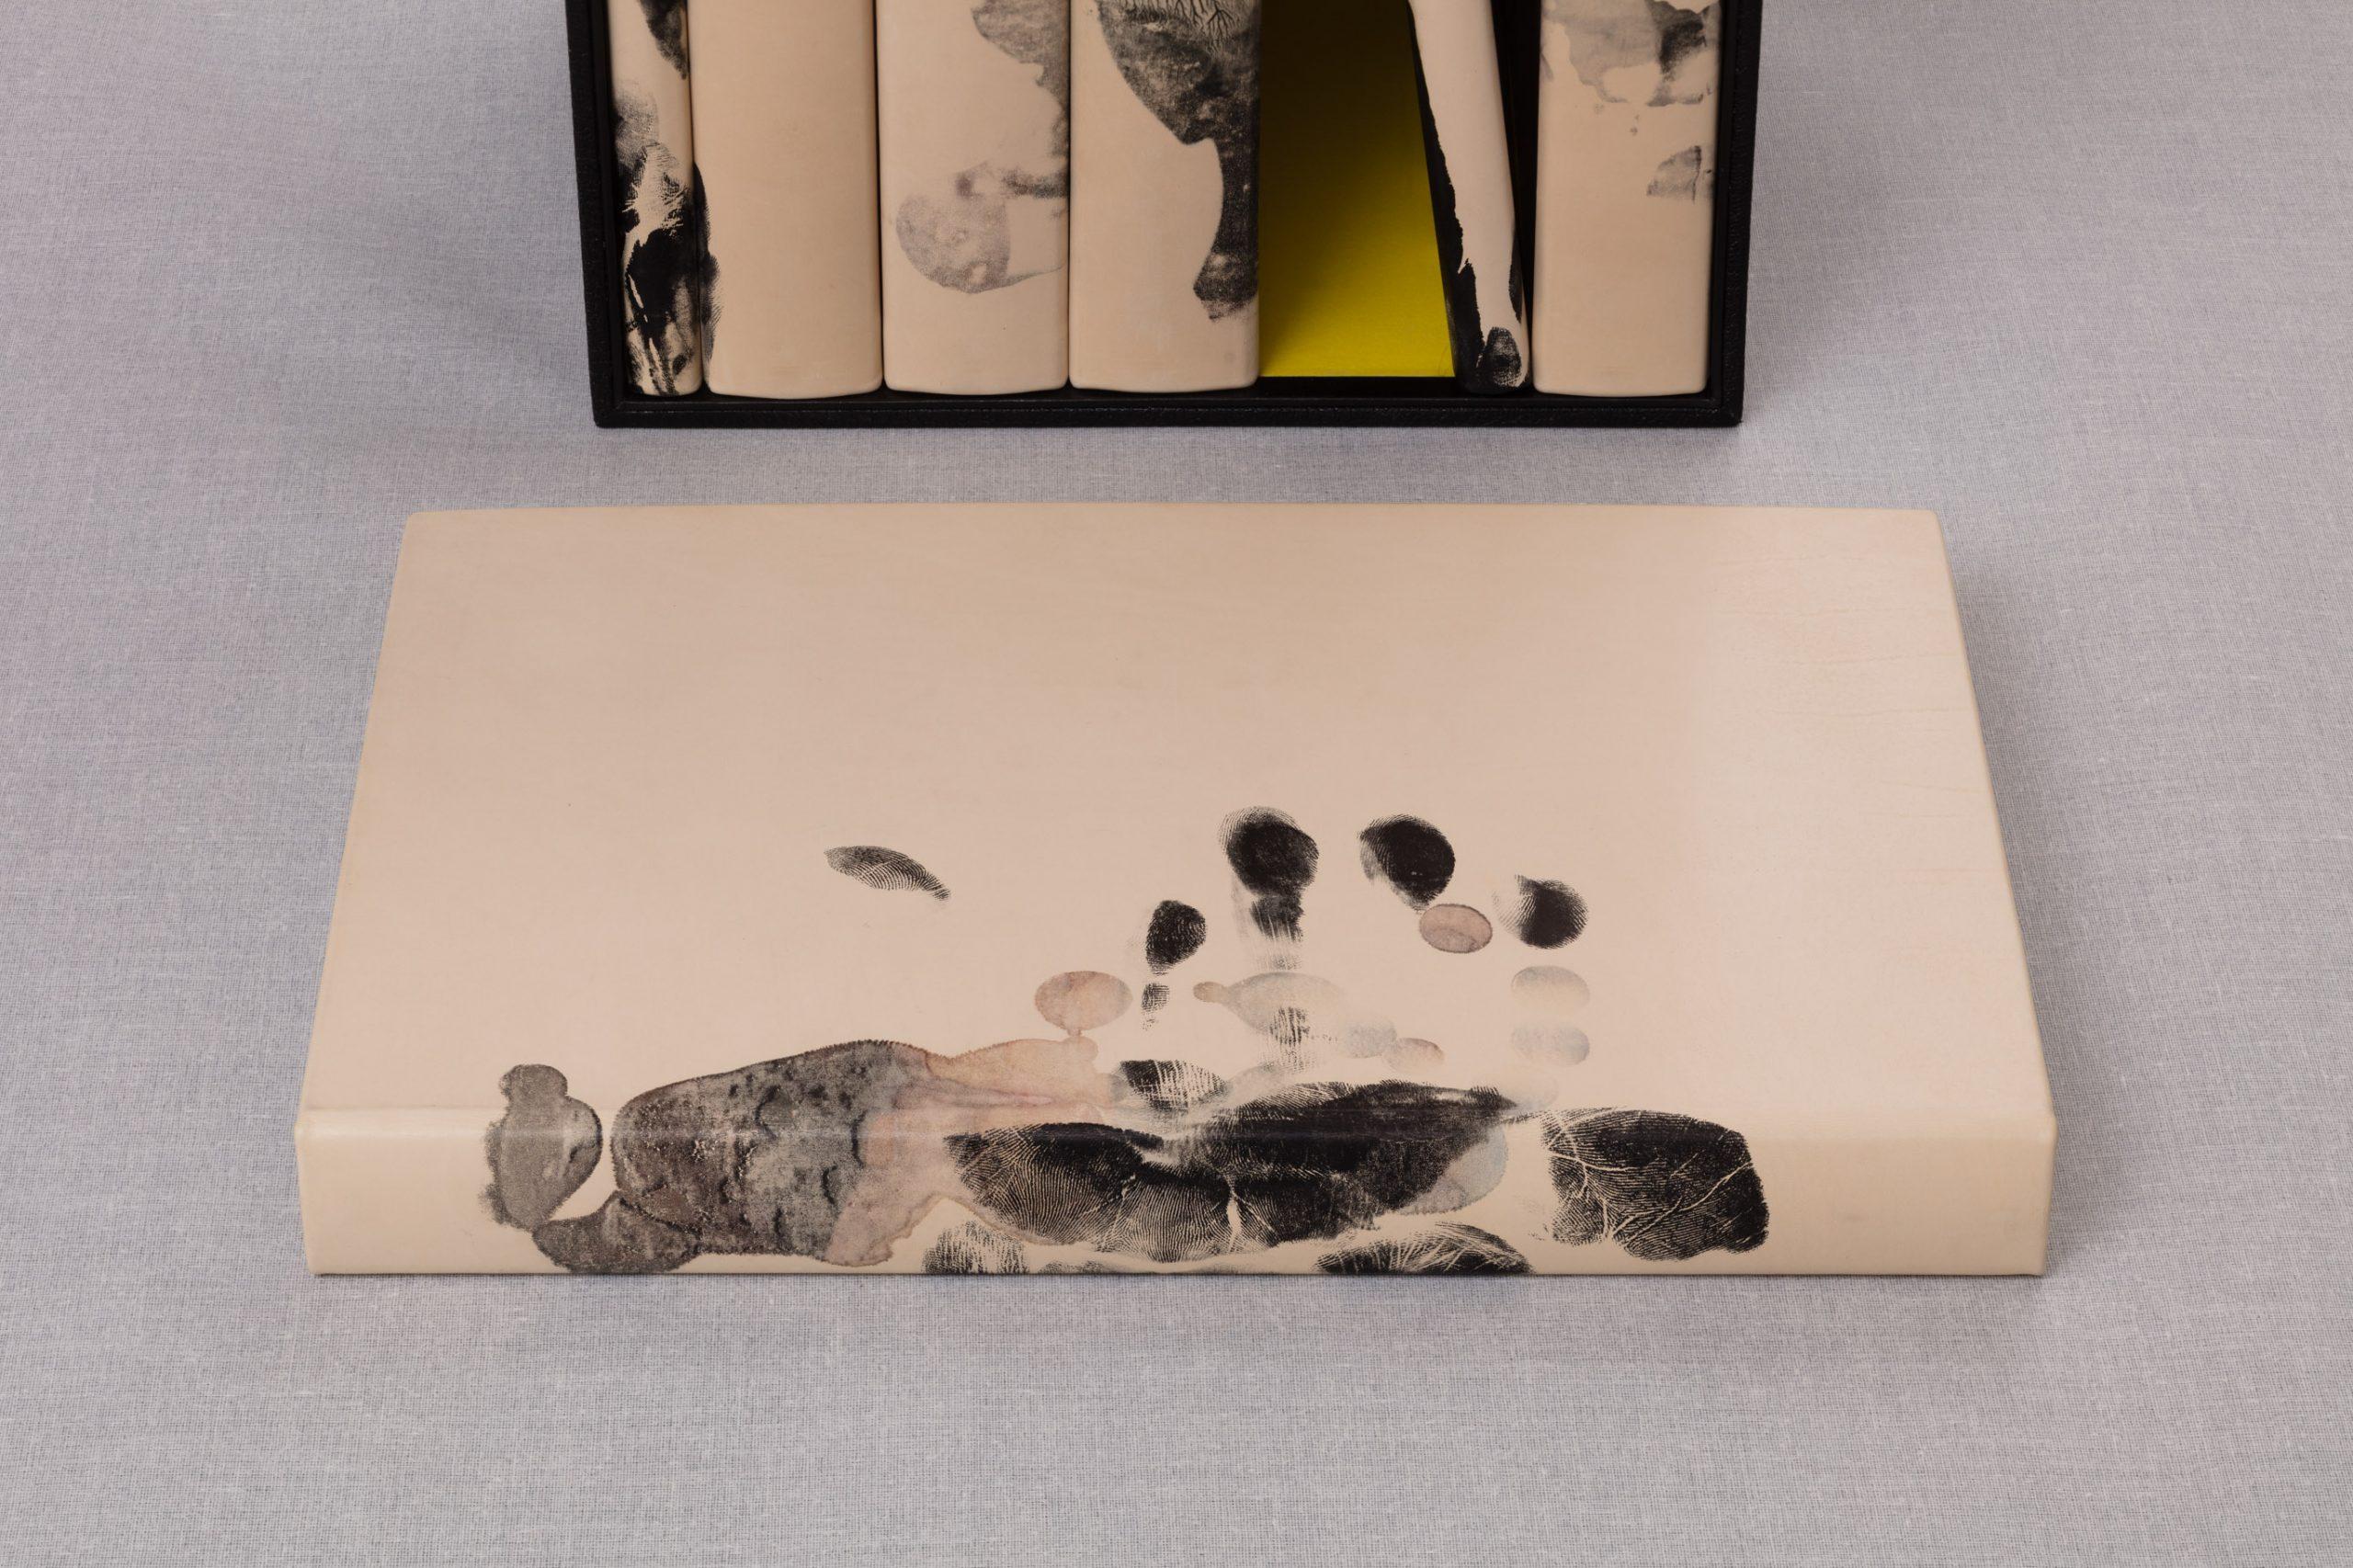 Douglas Gordon - Envy (Book on table)